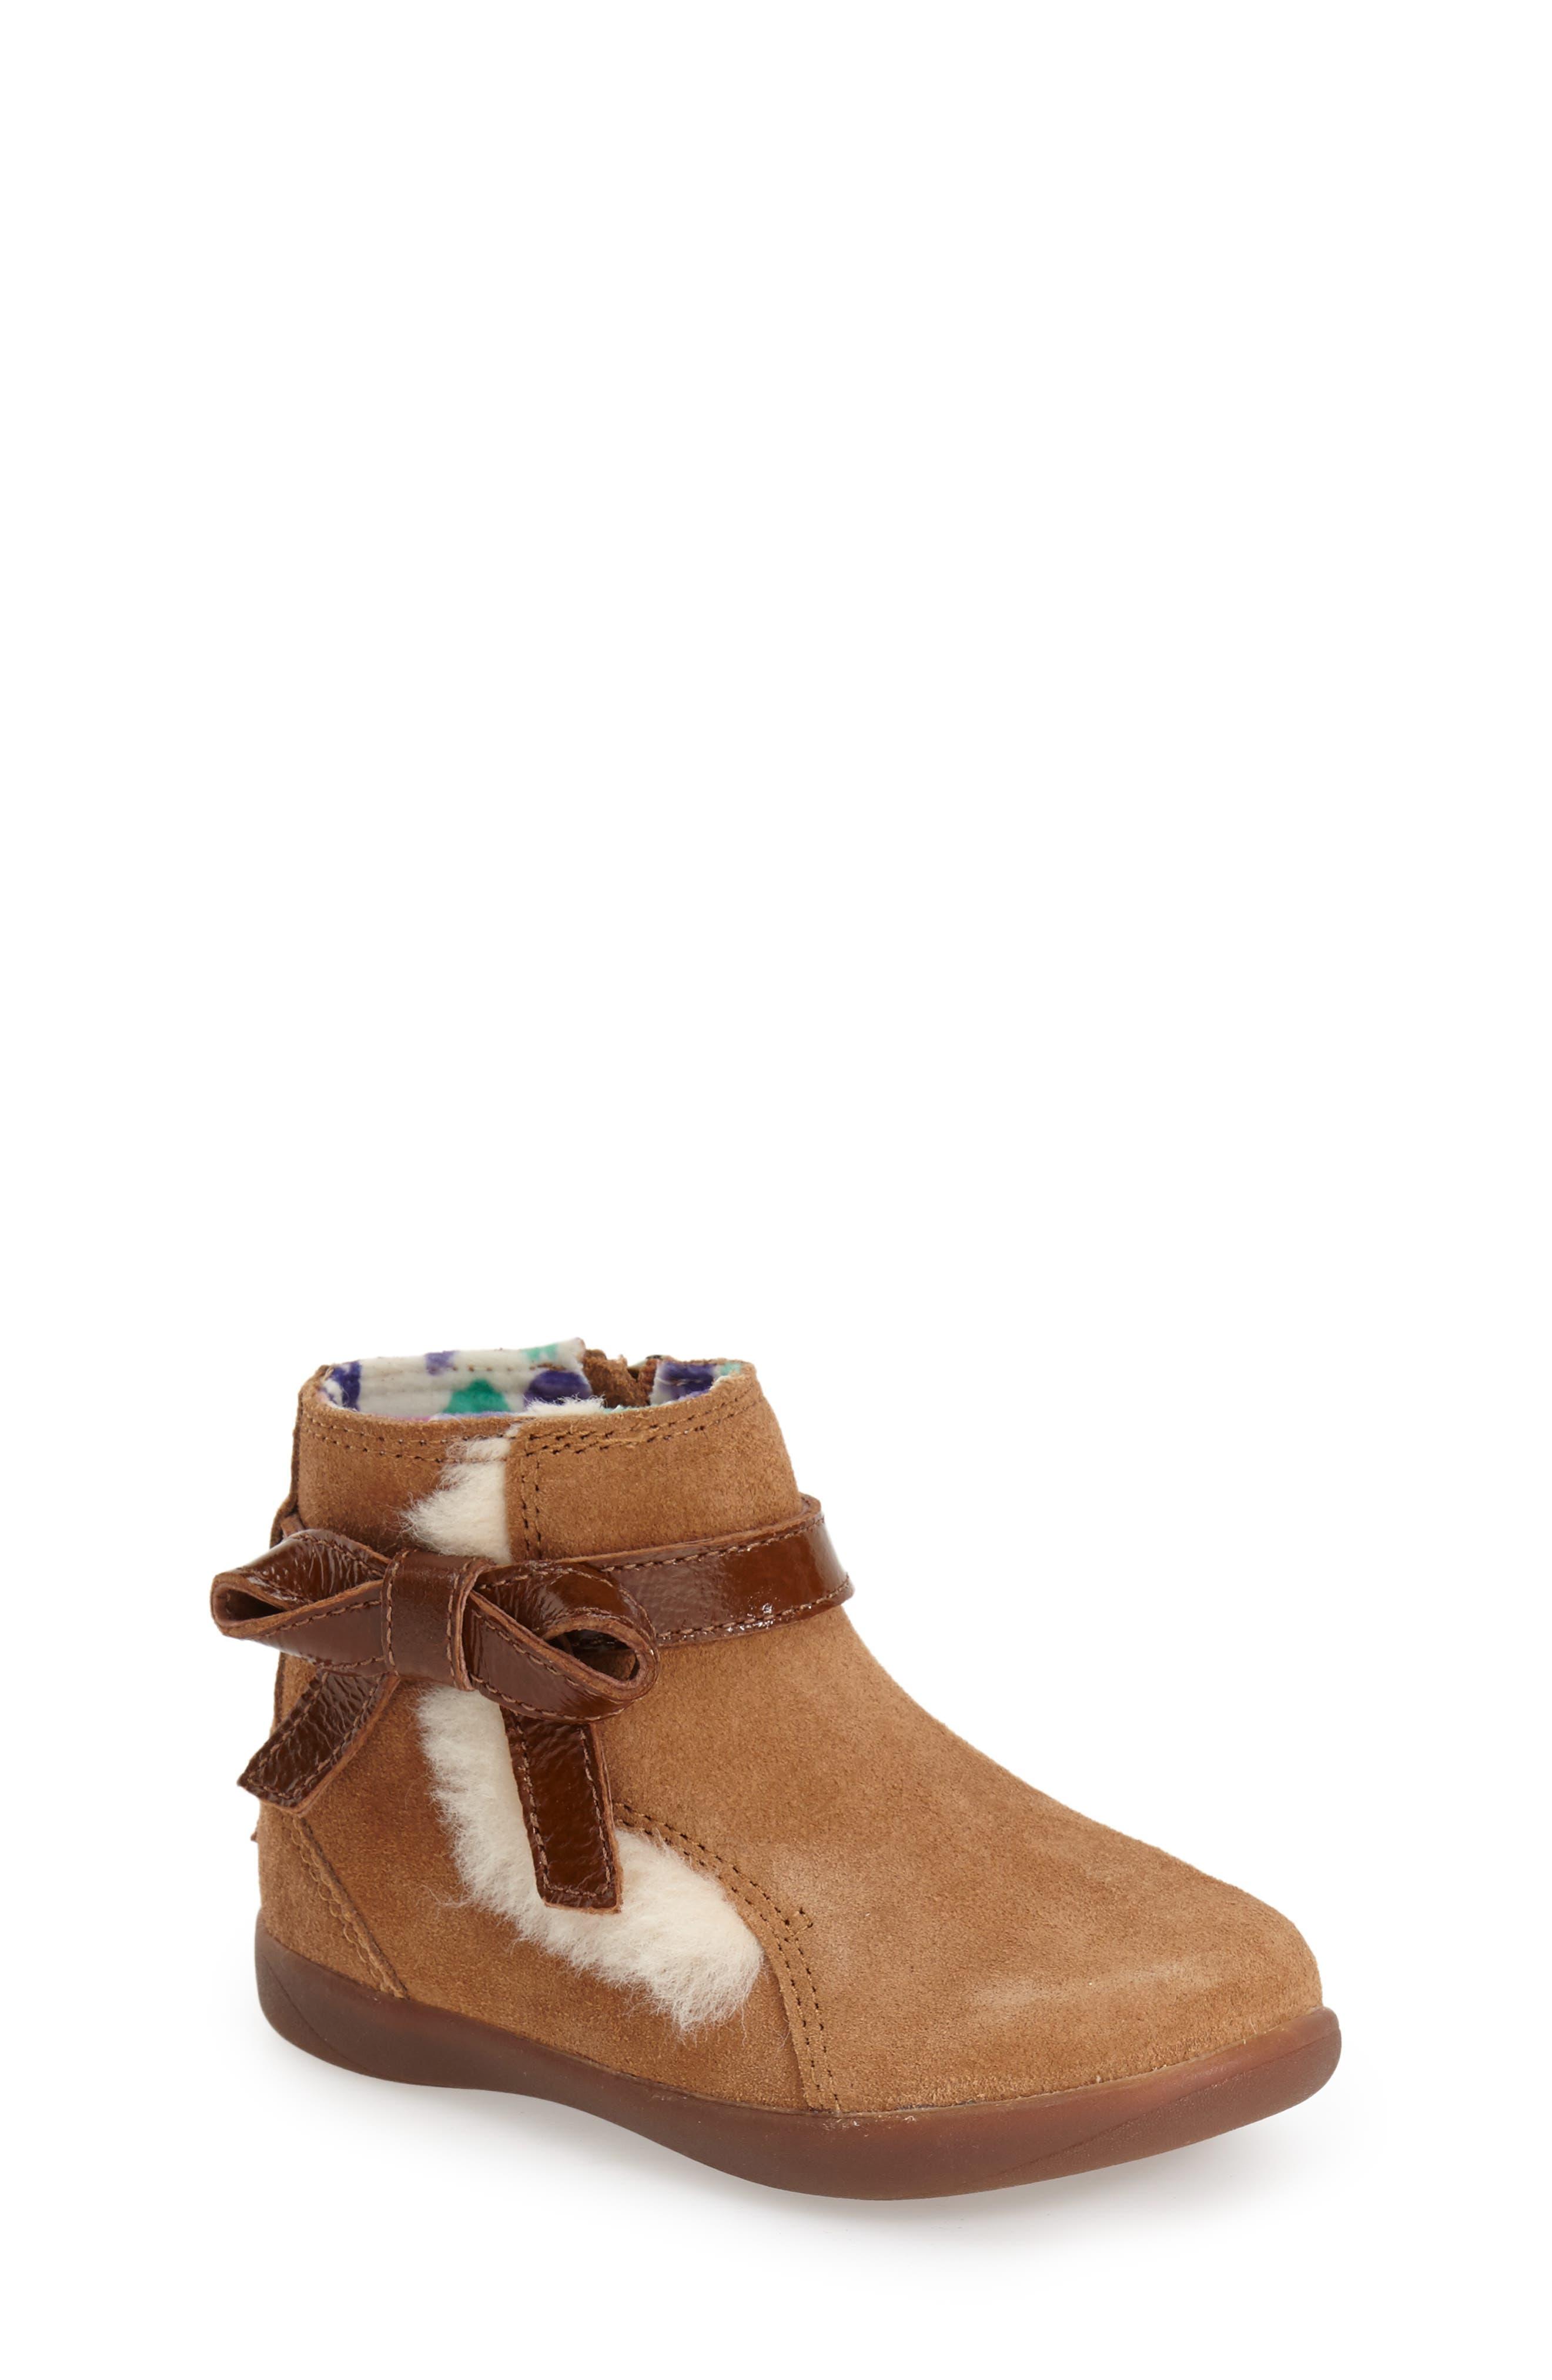 Australia Libbie Boot,                         Main,                         color, CHESTNUT BROWN